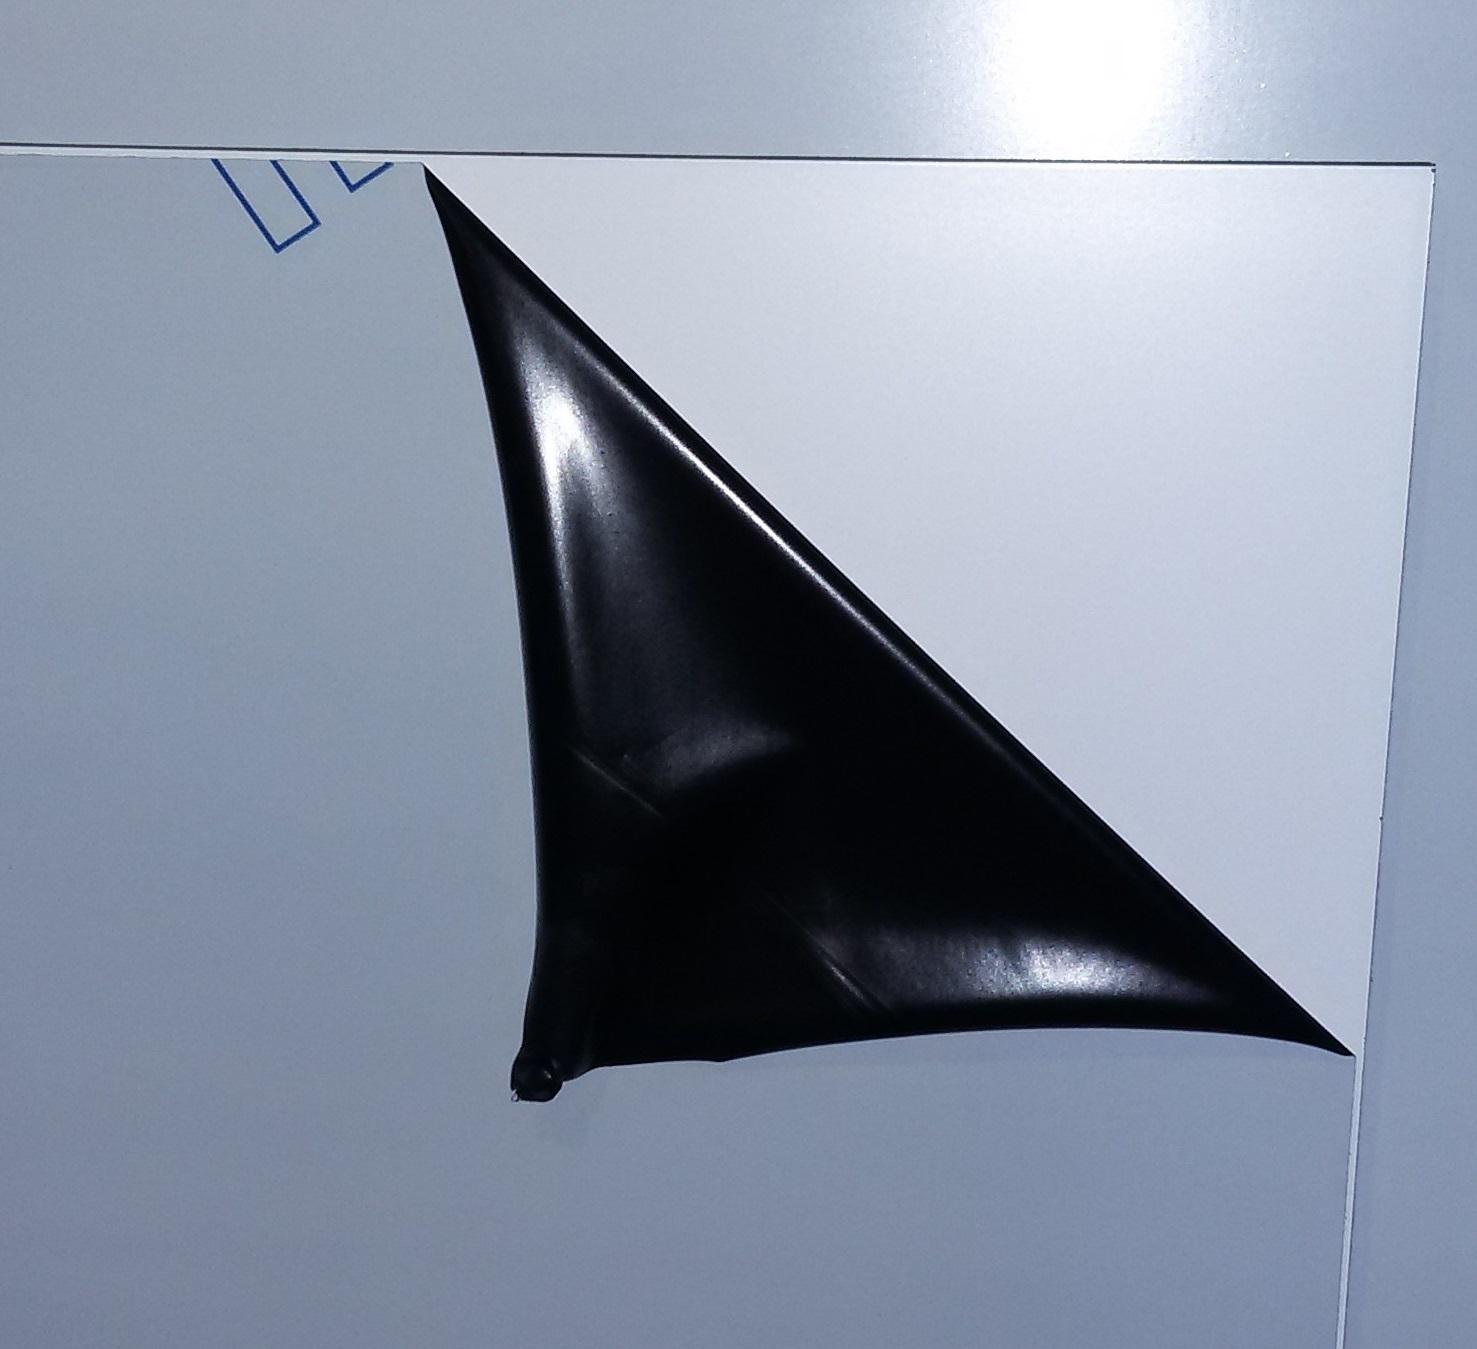 Profile Metall De Aluverbundplatte Weiss 3 Mm Alu Verbundplatte